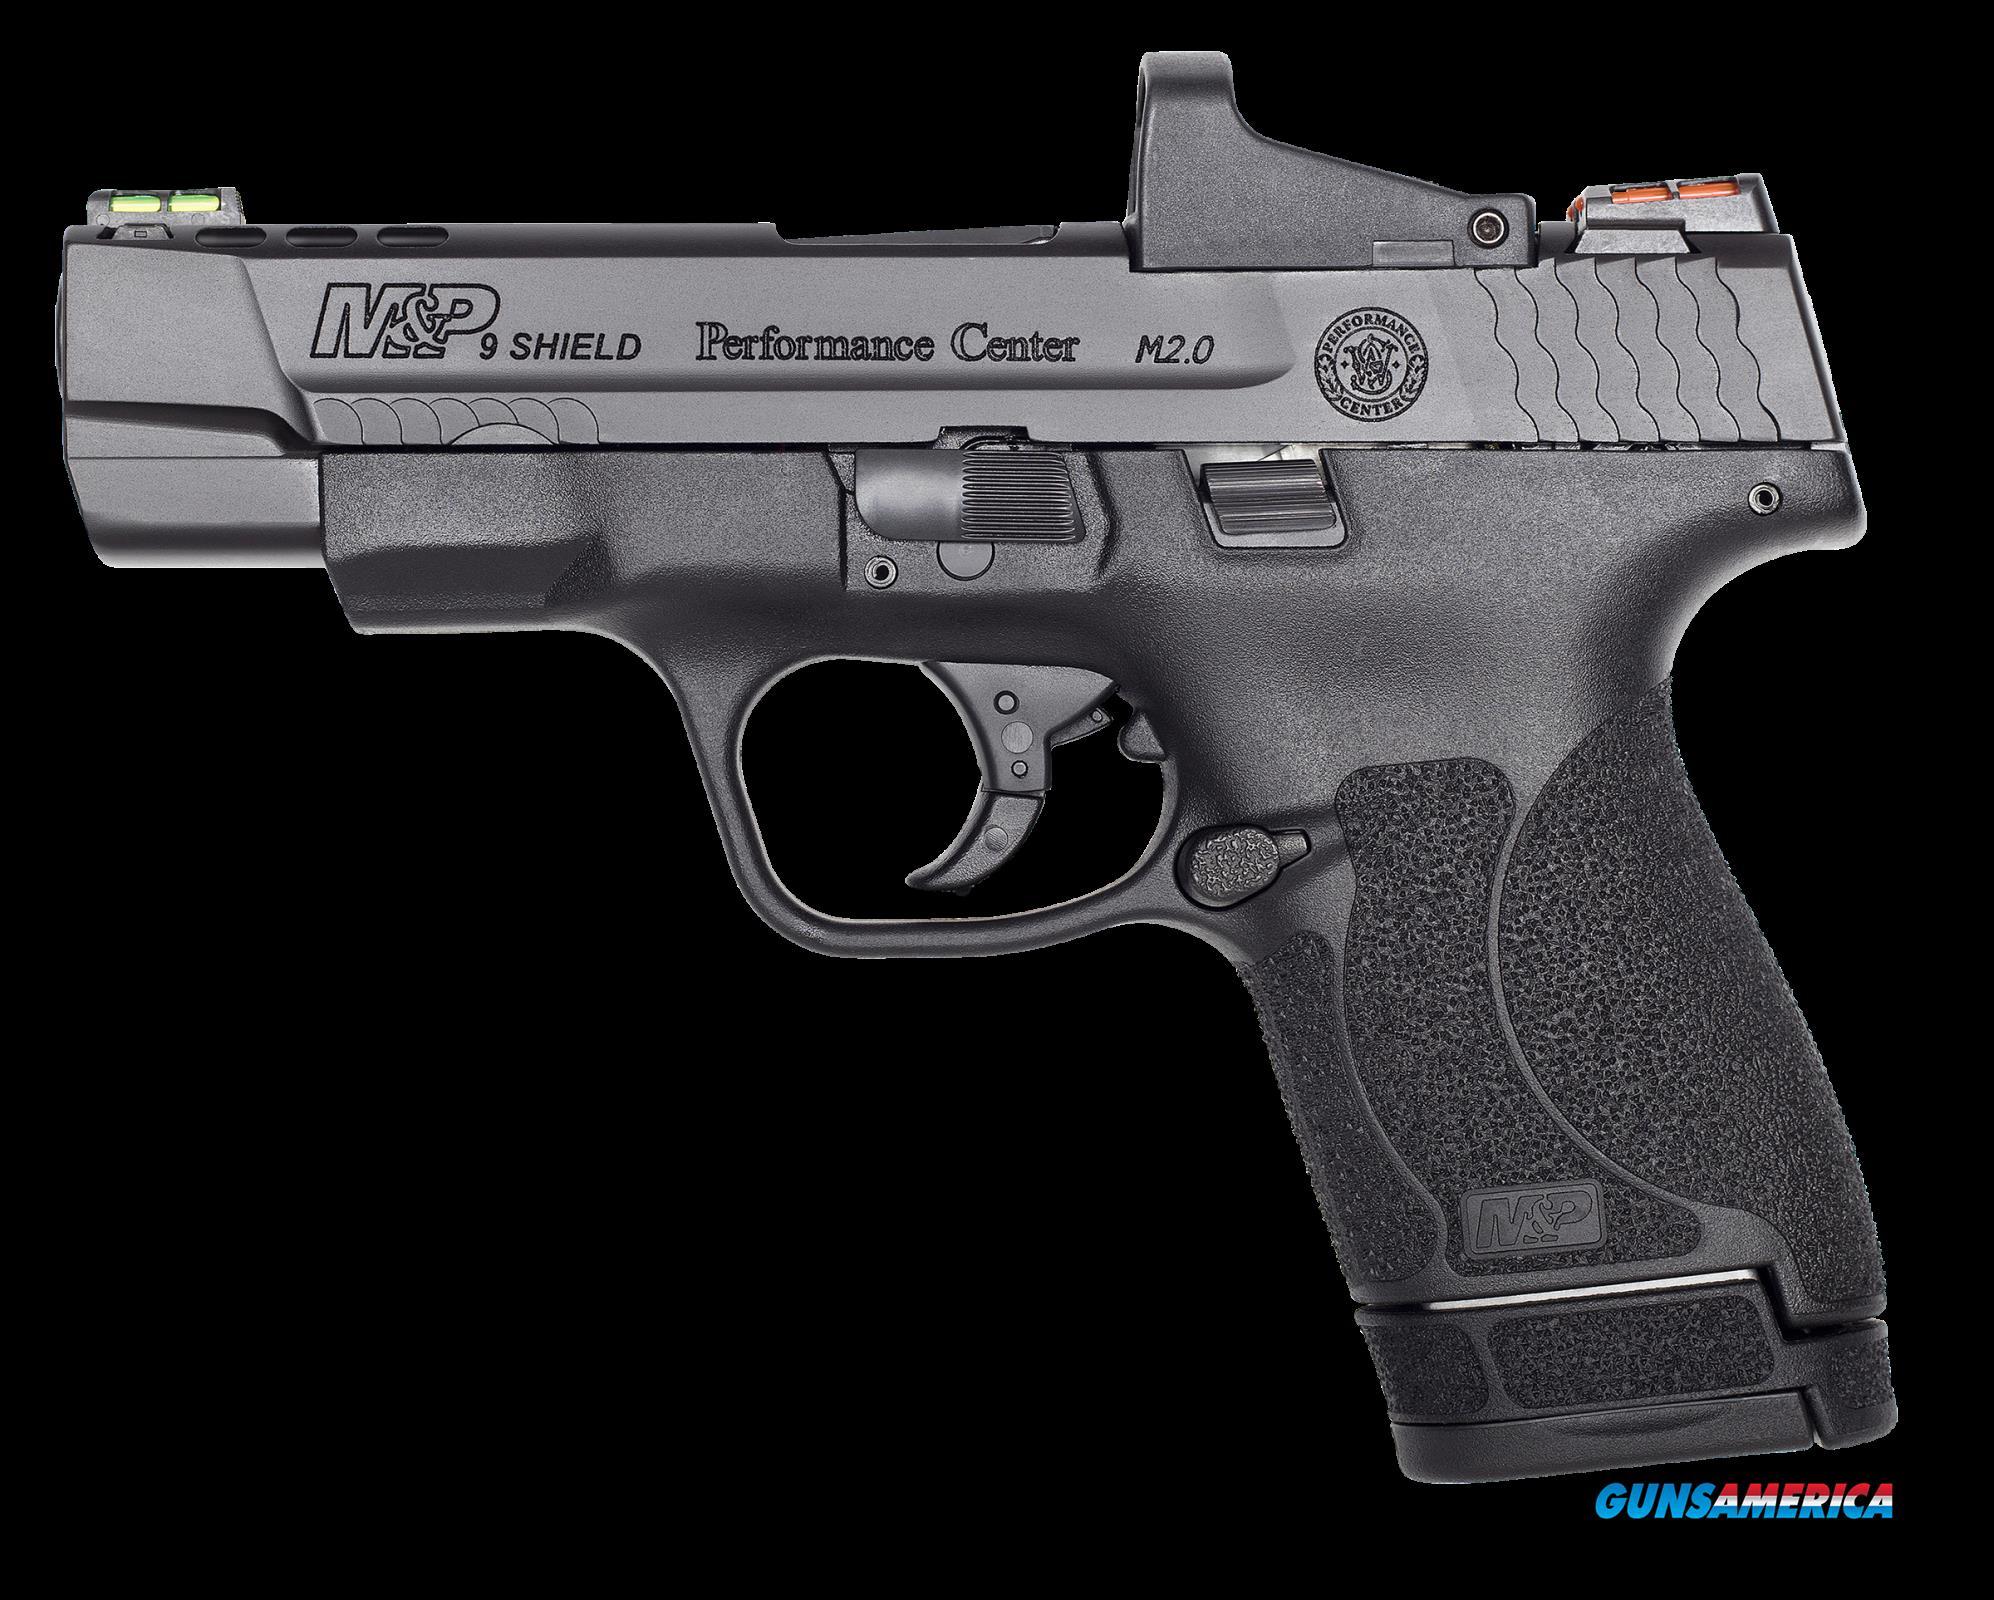 Smith & Wesson Performance Center, S&w M&p9shld   11788 Pfmc 9m 2.0 4in Pt       8-7r  Guns > Pistols > 1911 Pistol Copies (non-Colt)